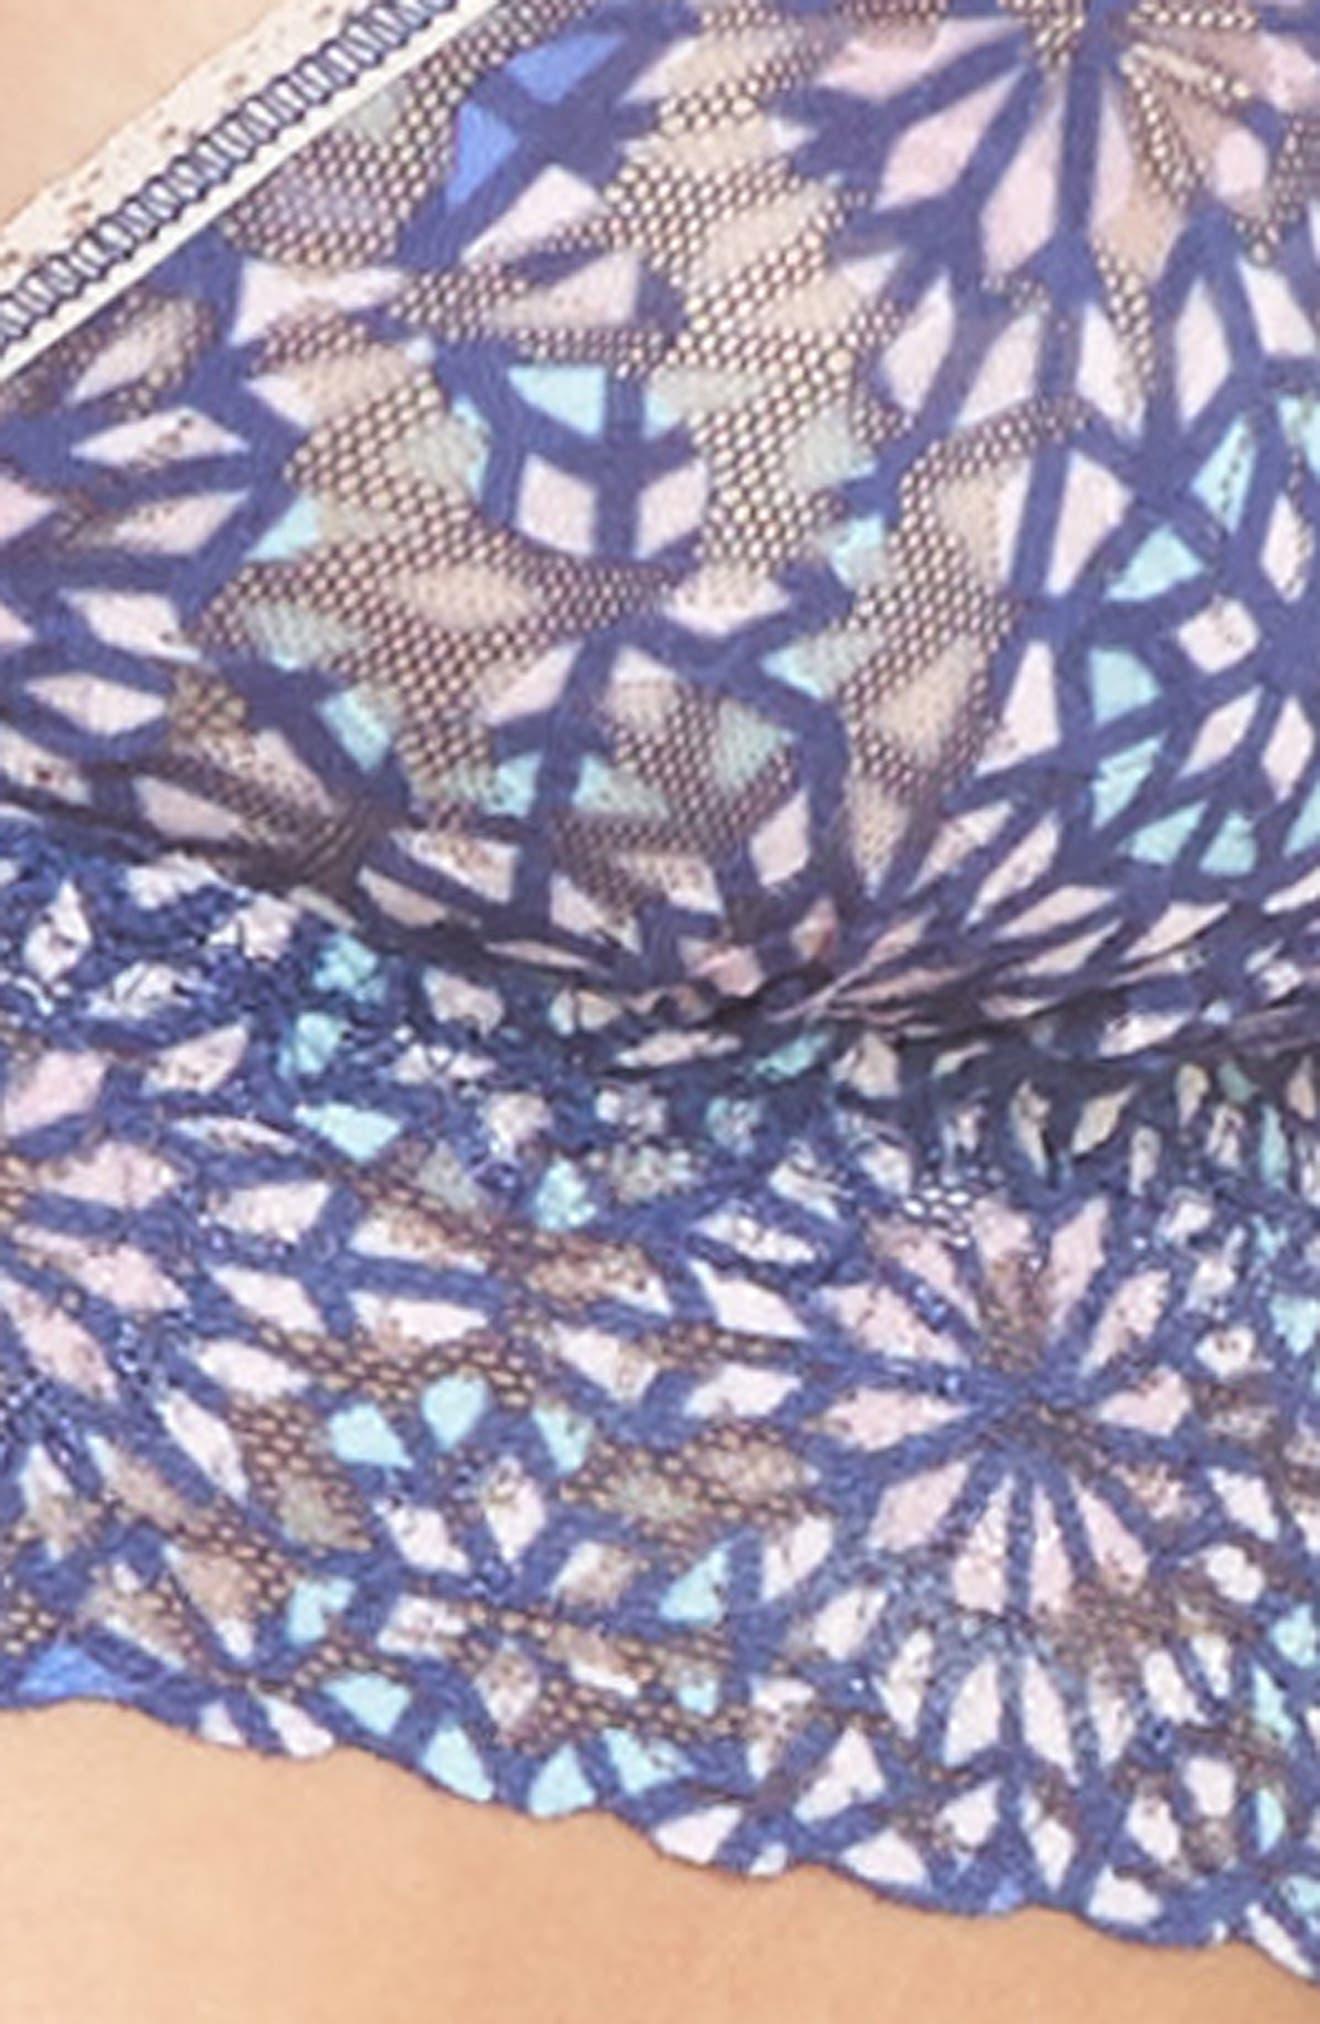 Maria Triangle Bralette,                             Alternate thumbnail 8, color,                             Blue Multi